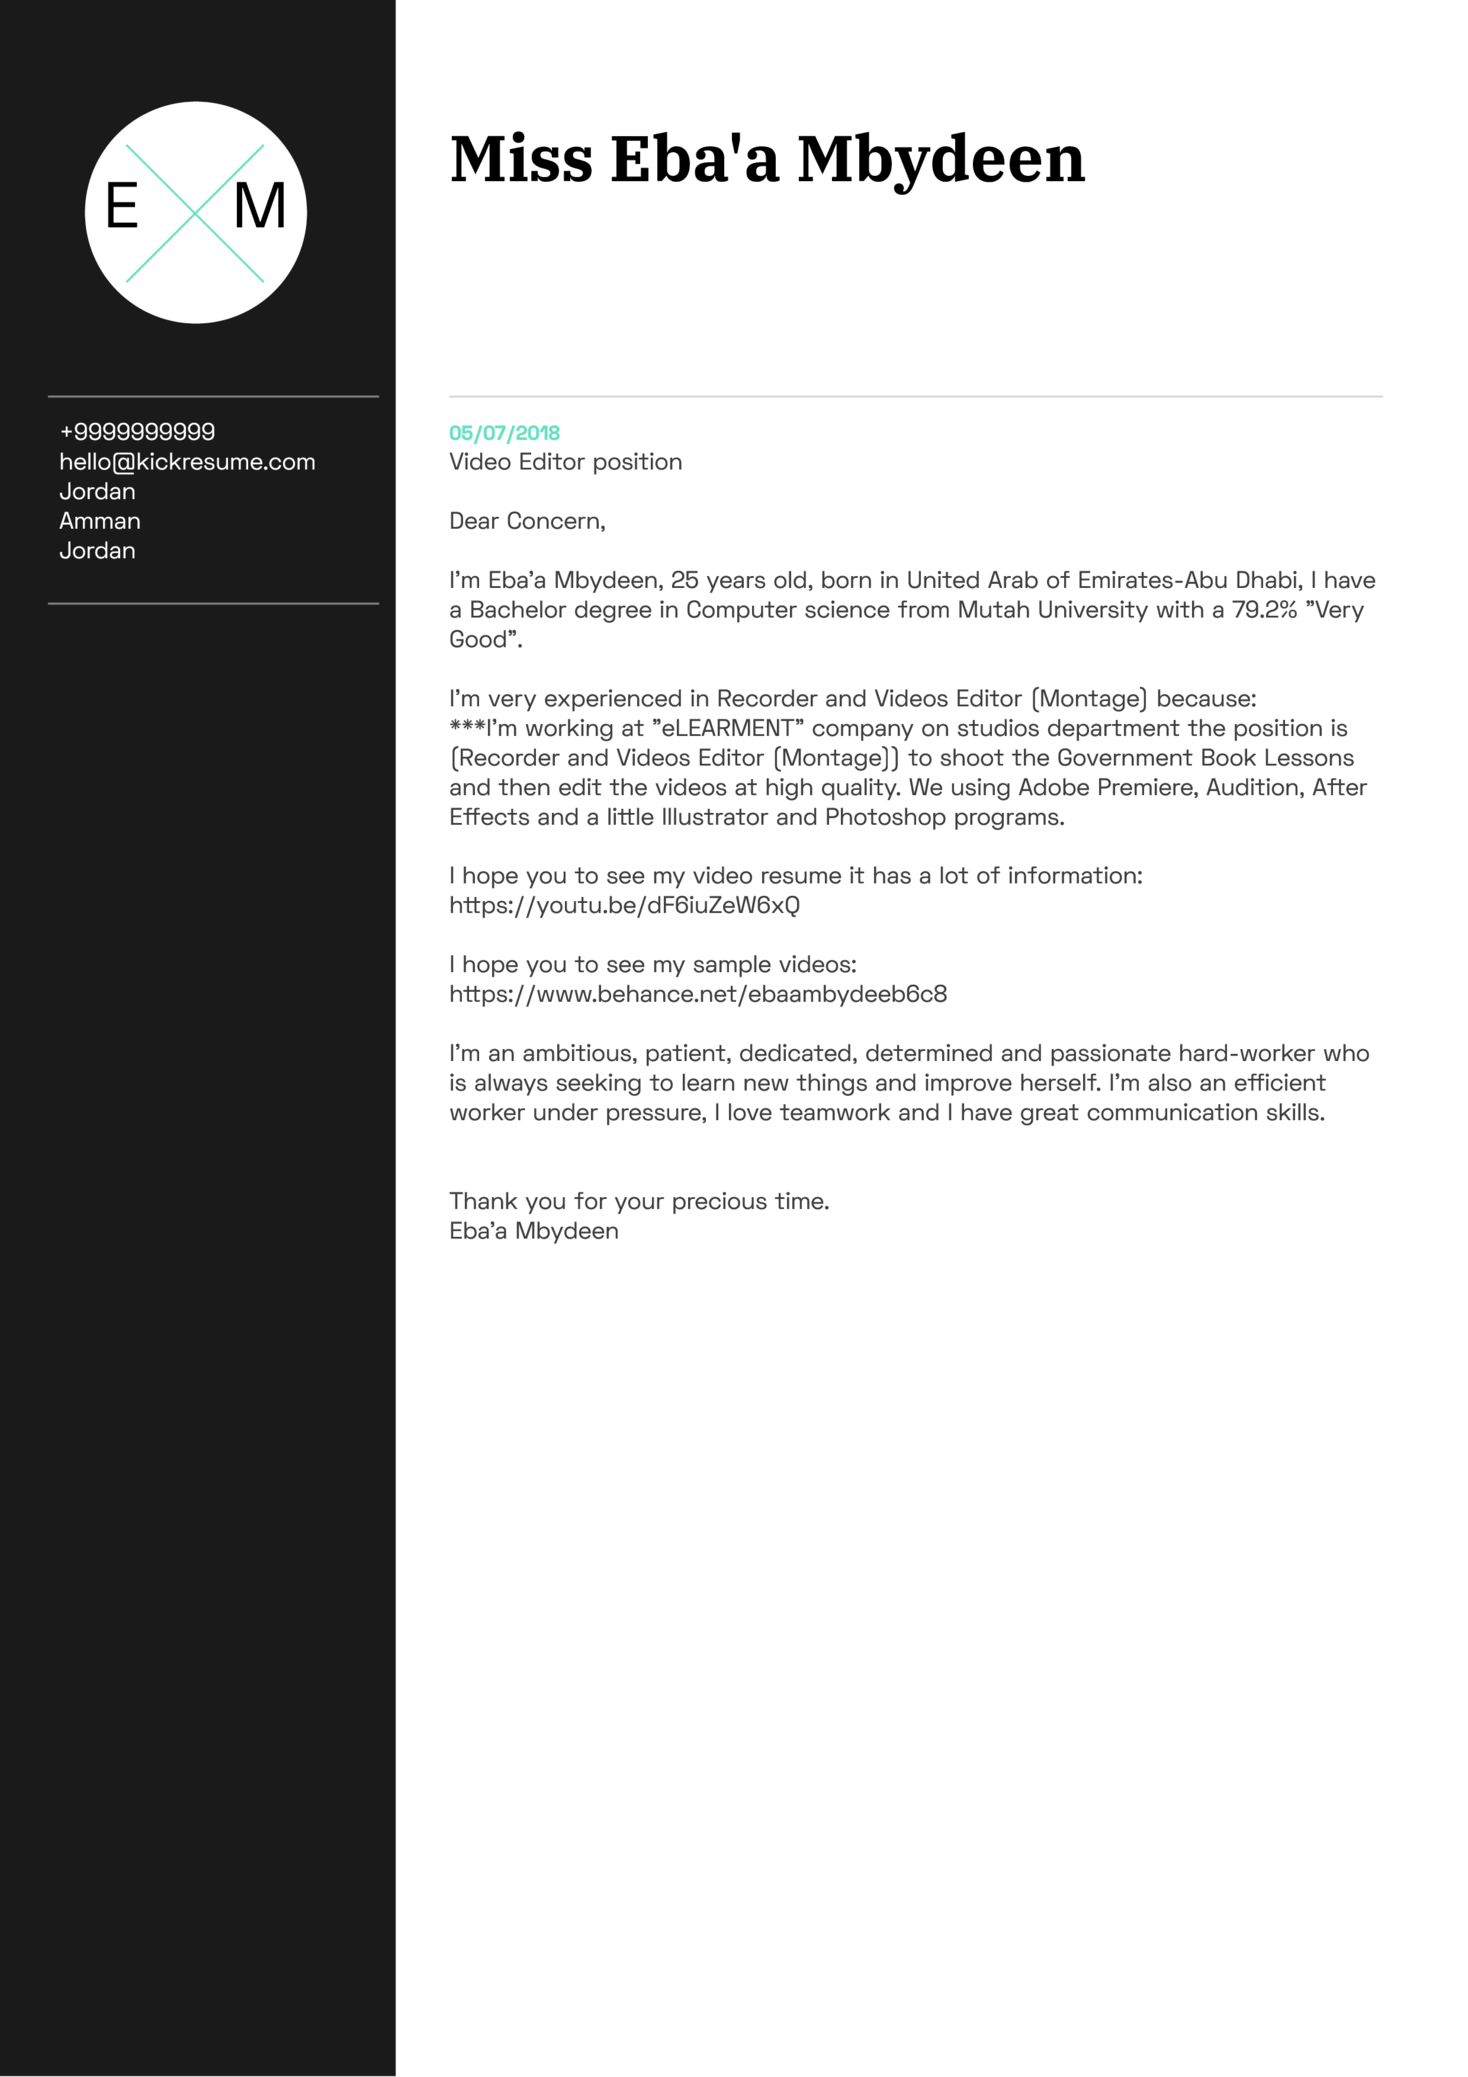 Video Editor Cover Letter Sample